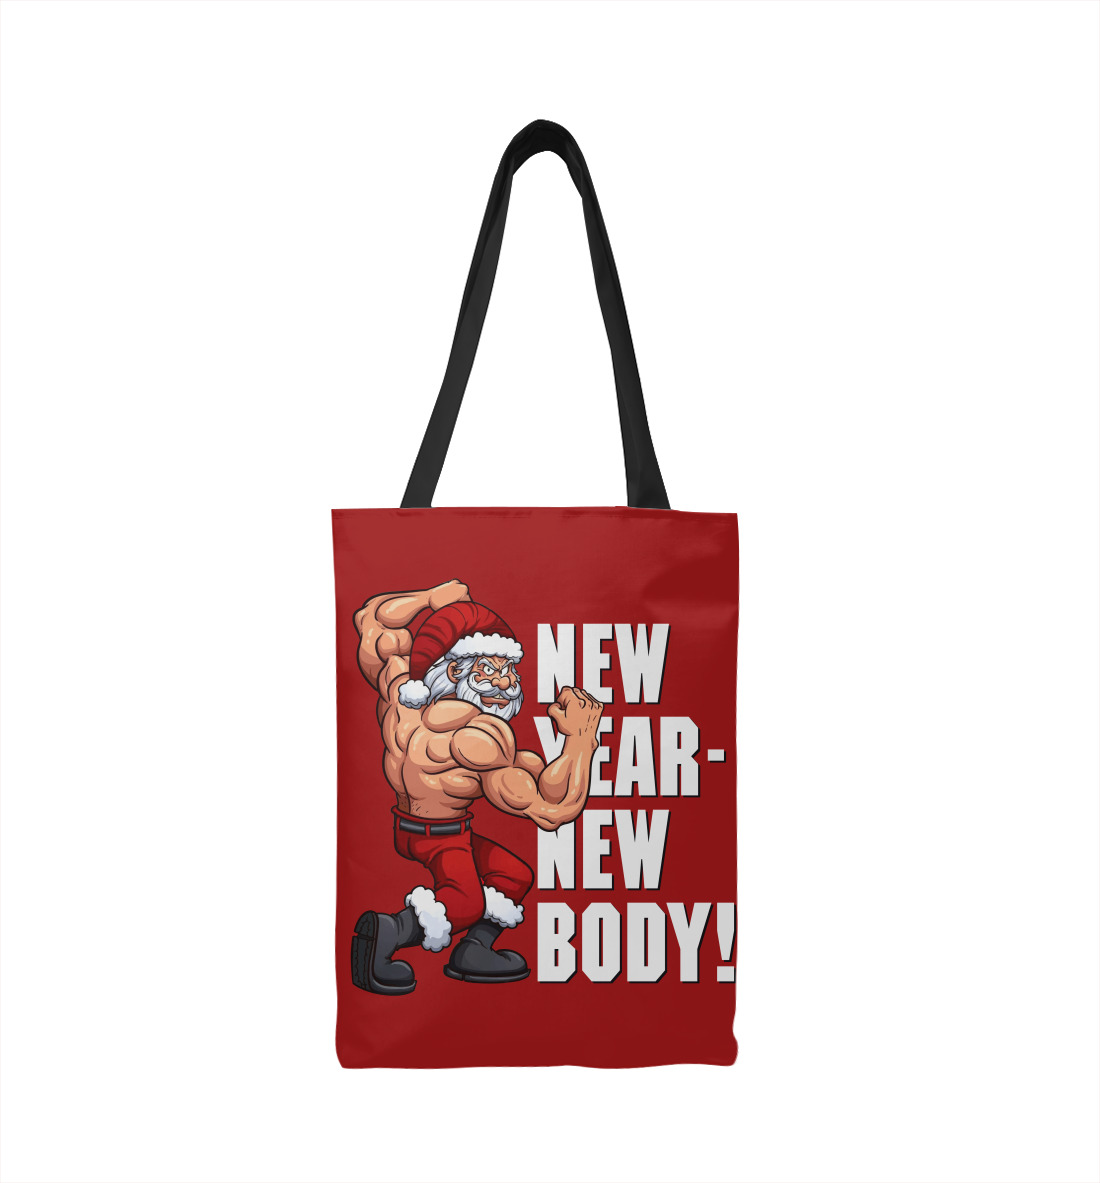 New Year - Body!